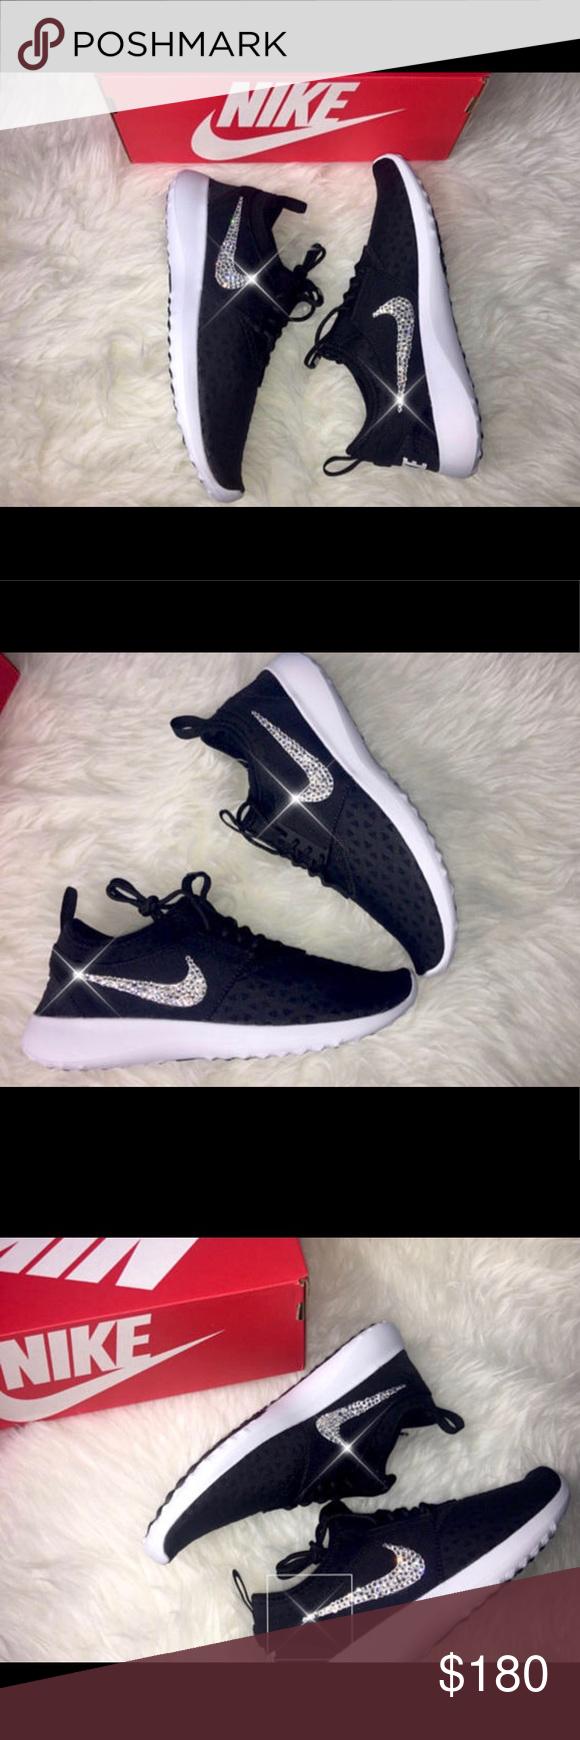 Black · Bling Swarovski Nike Juvenate Black Sneakers ...